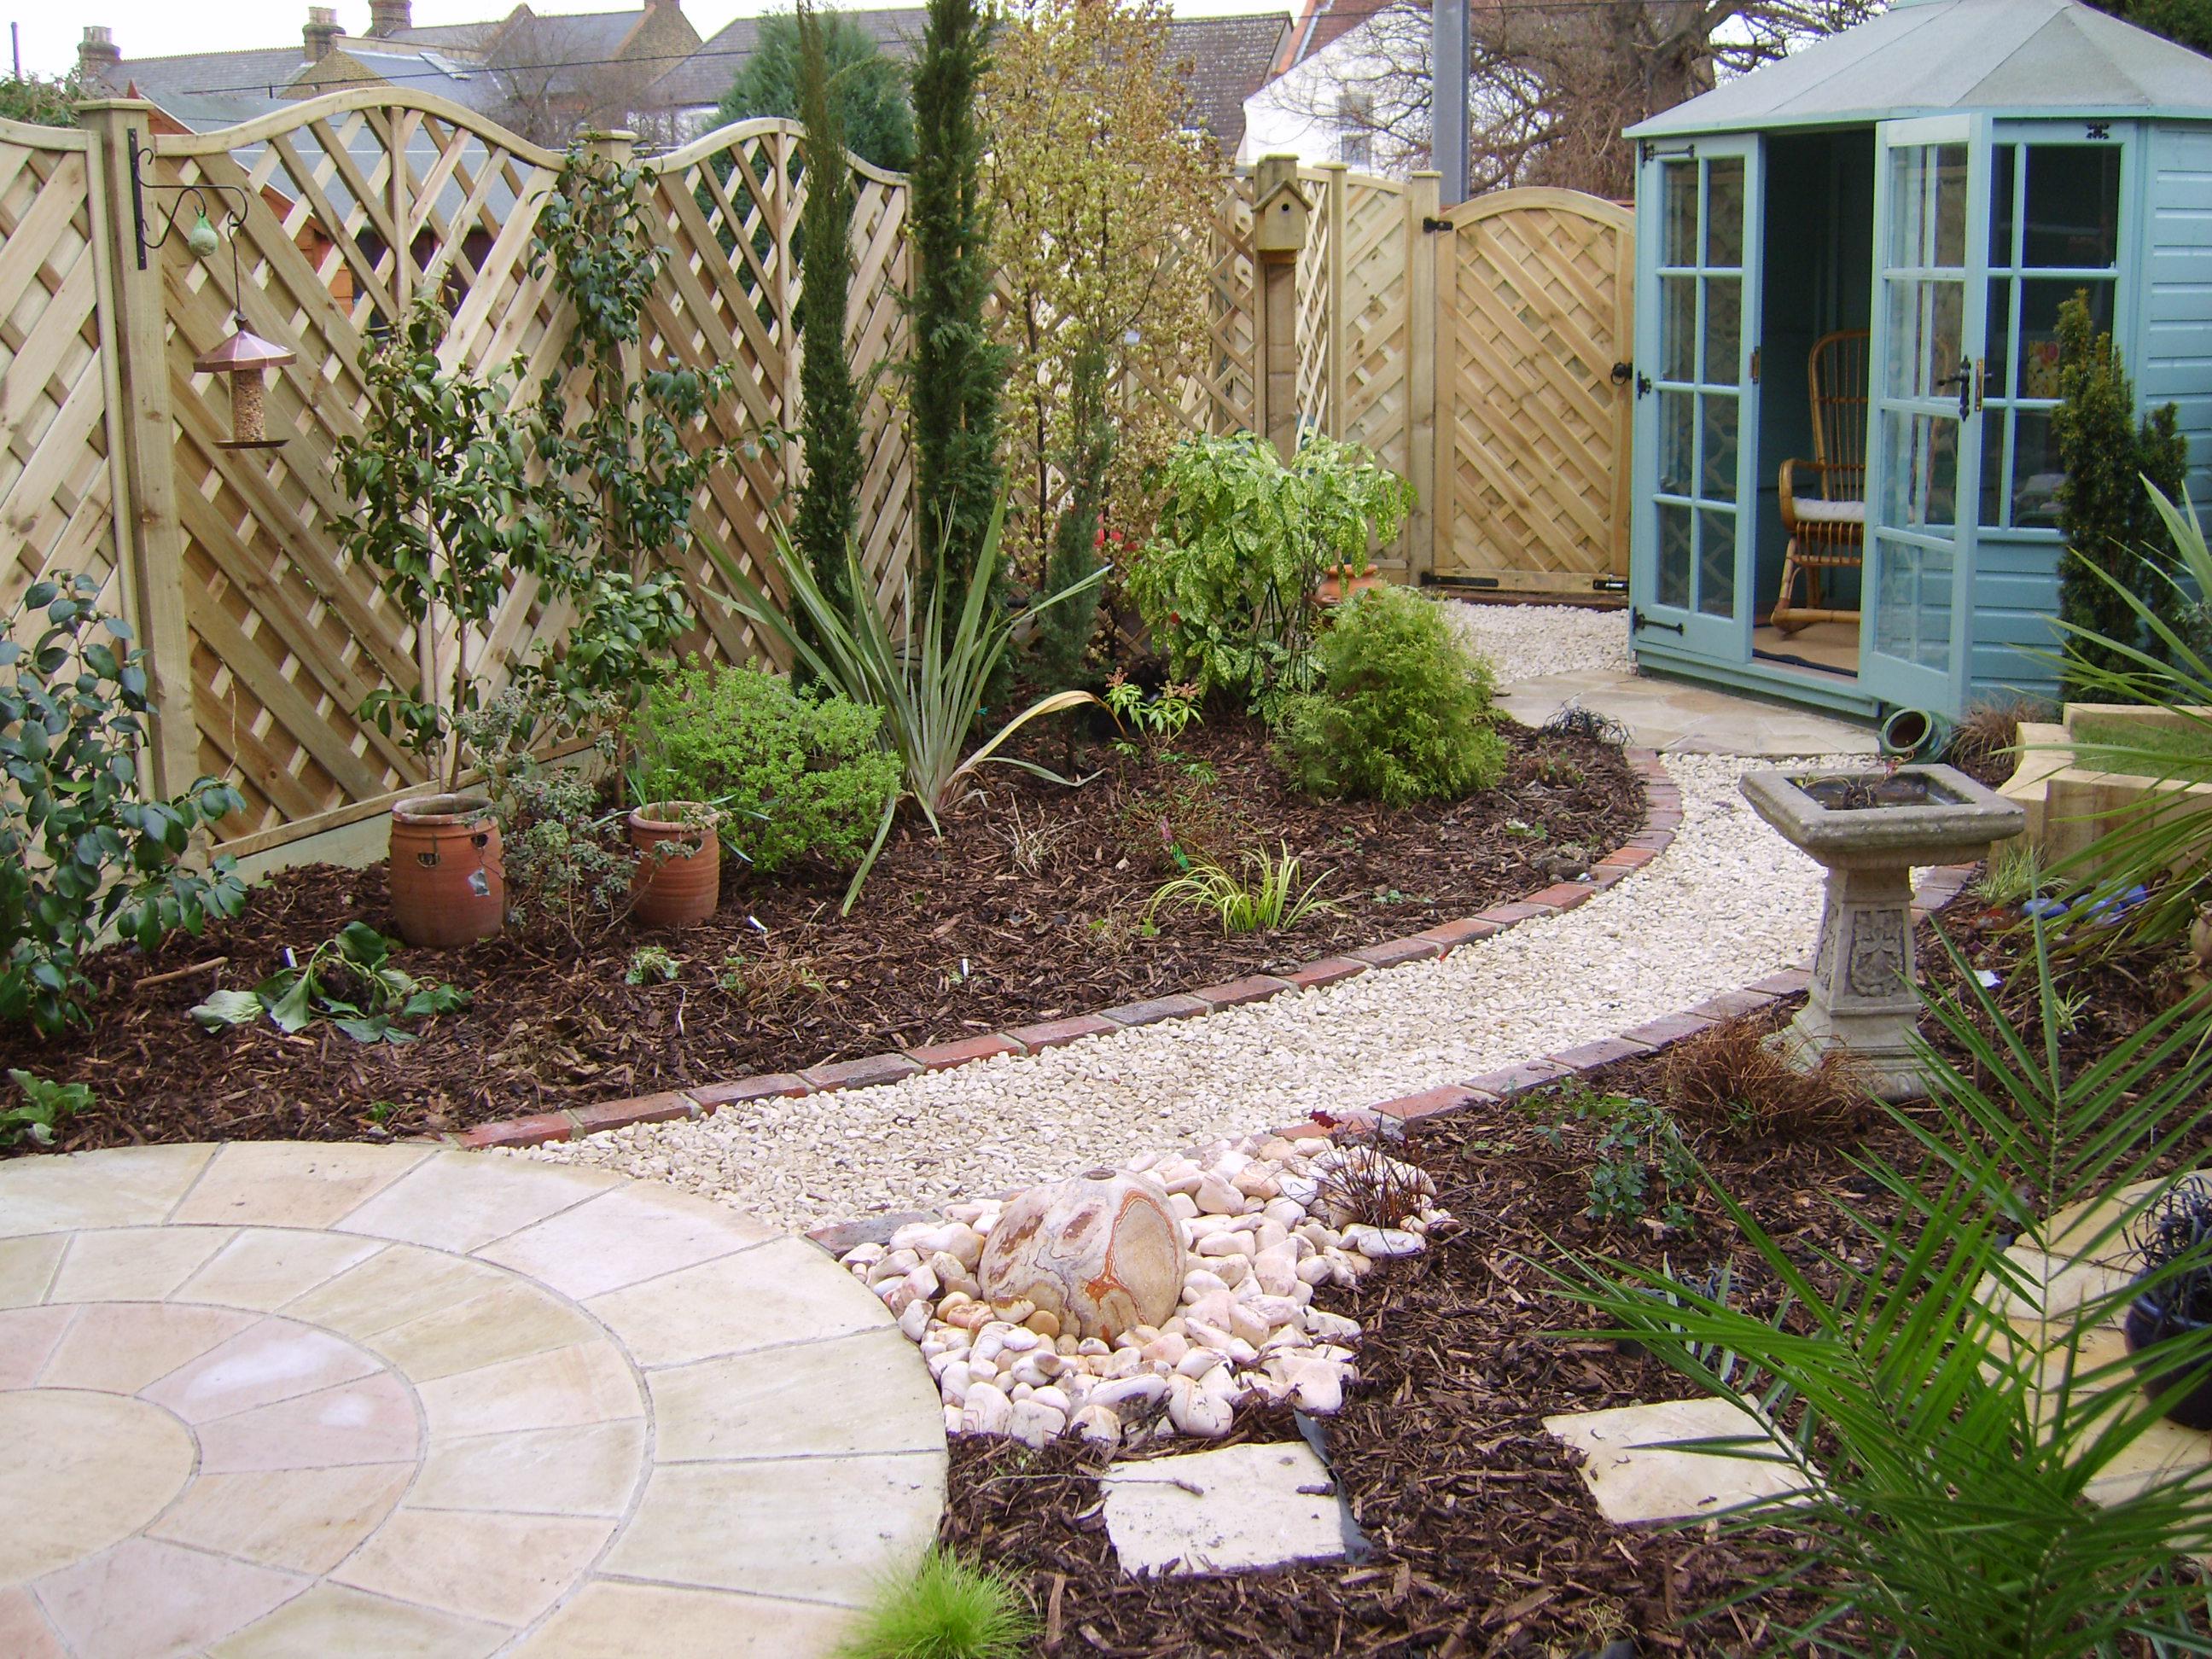 Victorian Garden Design By Floral & Hardy